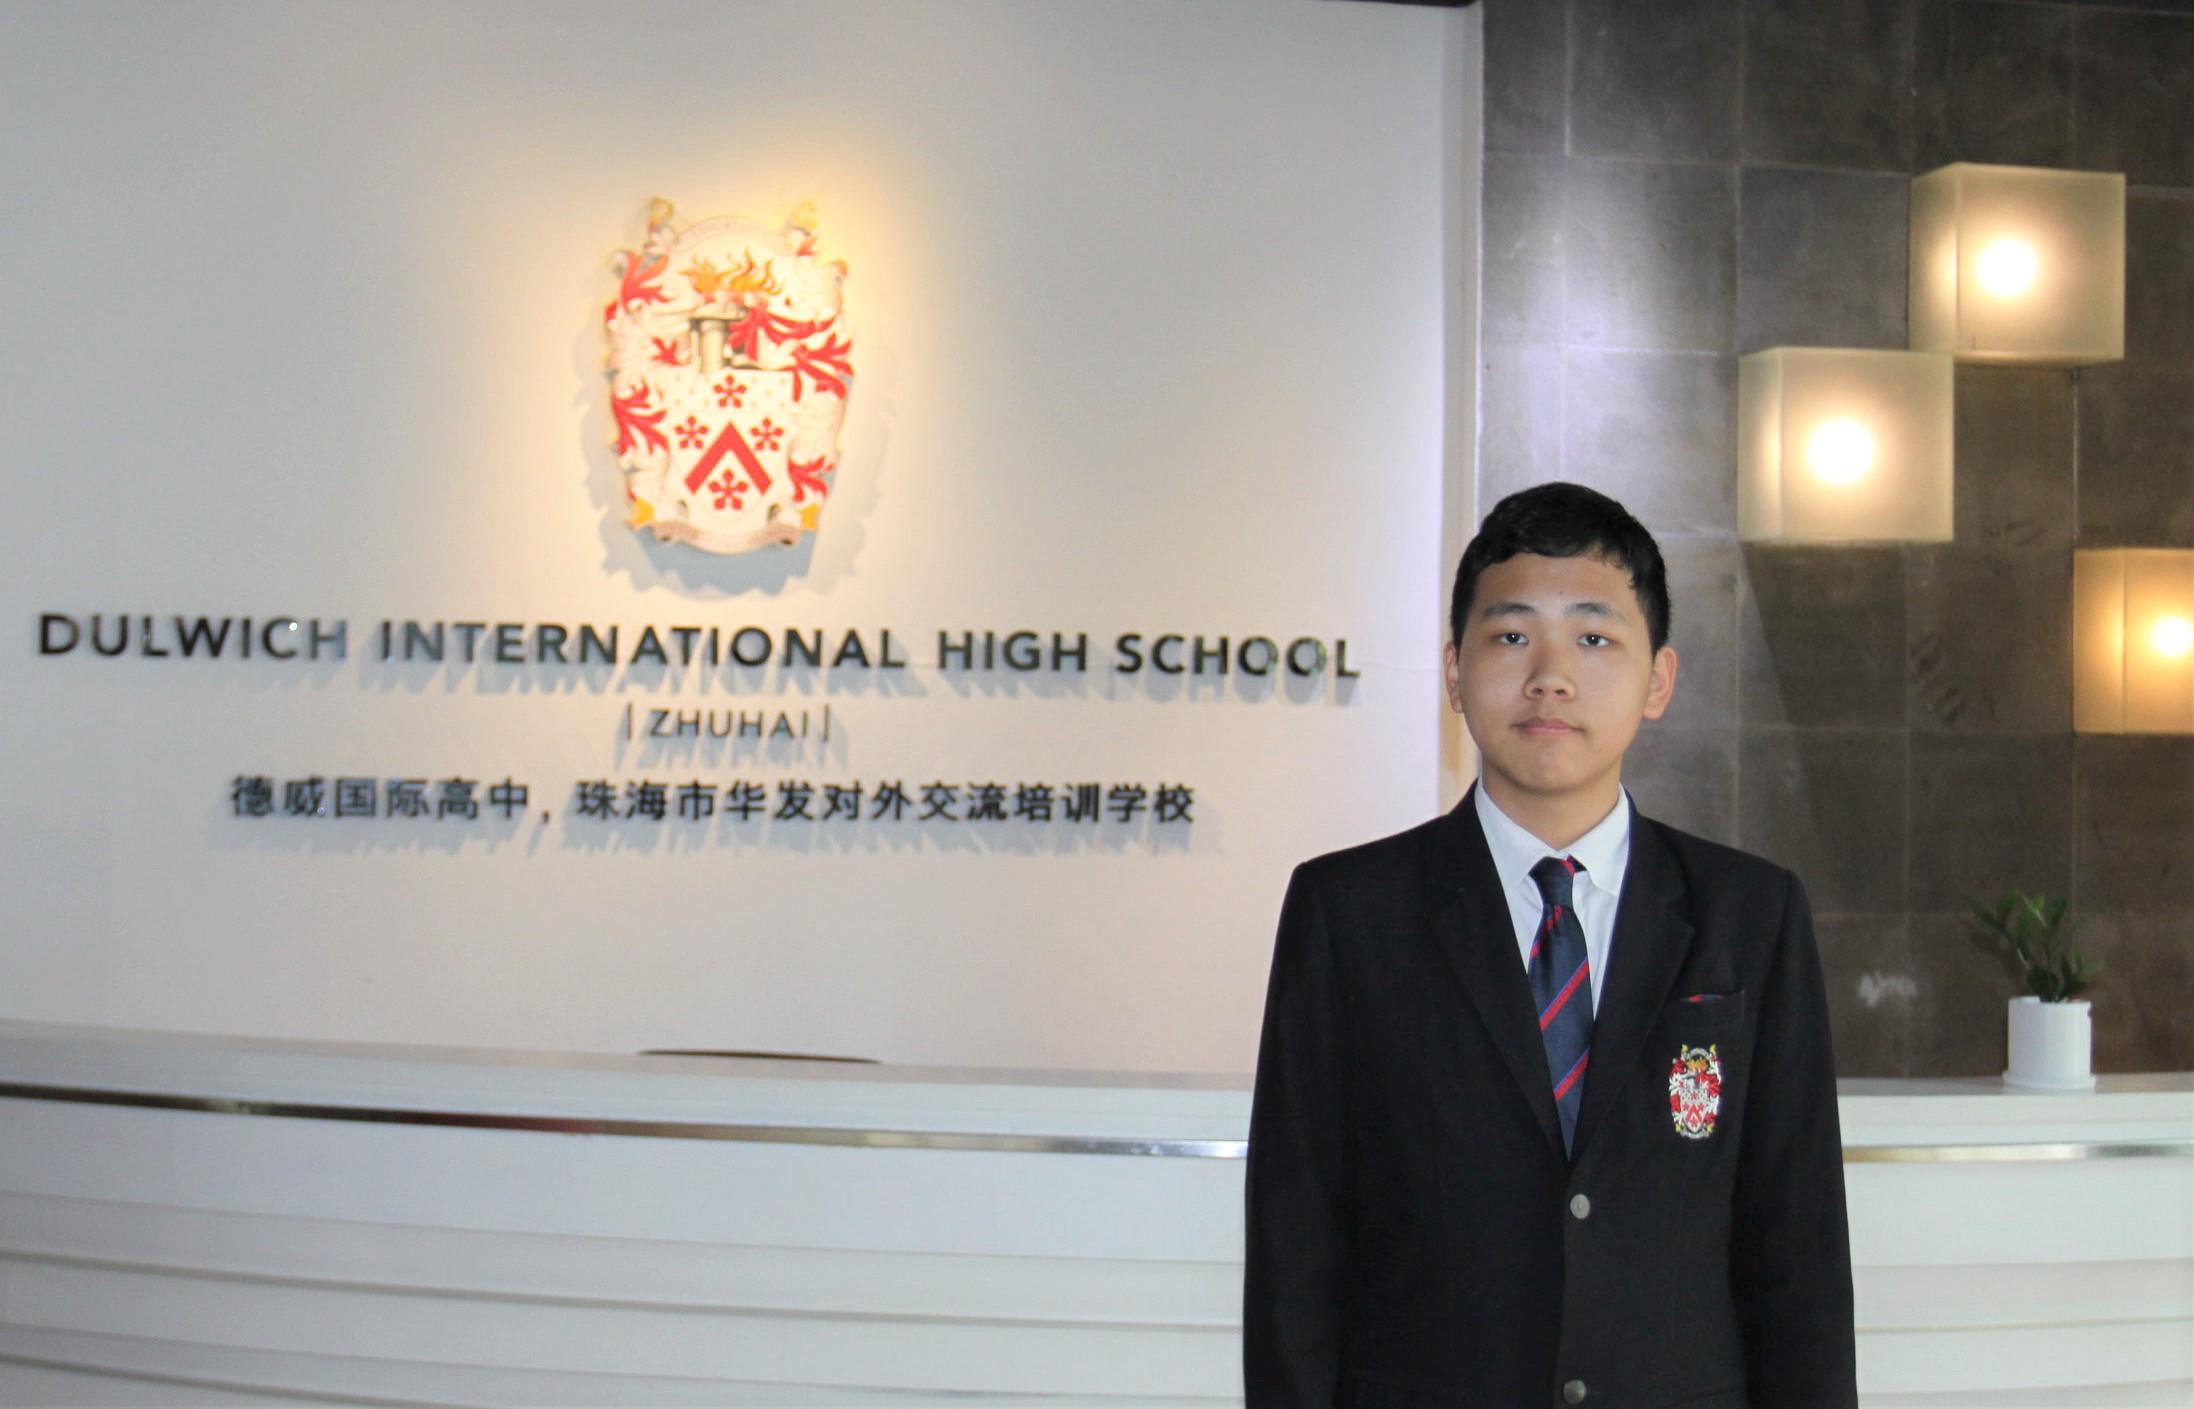 img-3742-珠海德威国际高中-20200529-120630-230